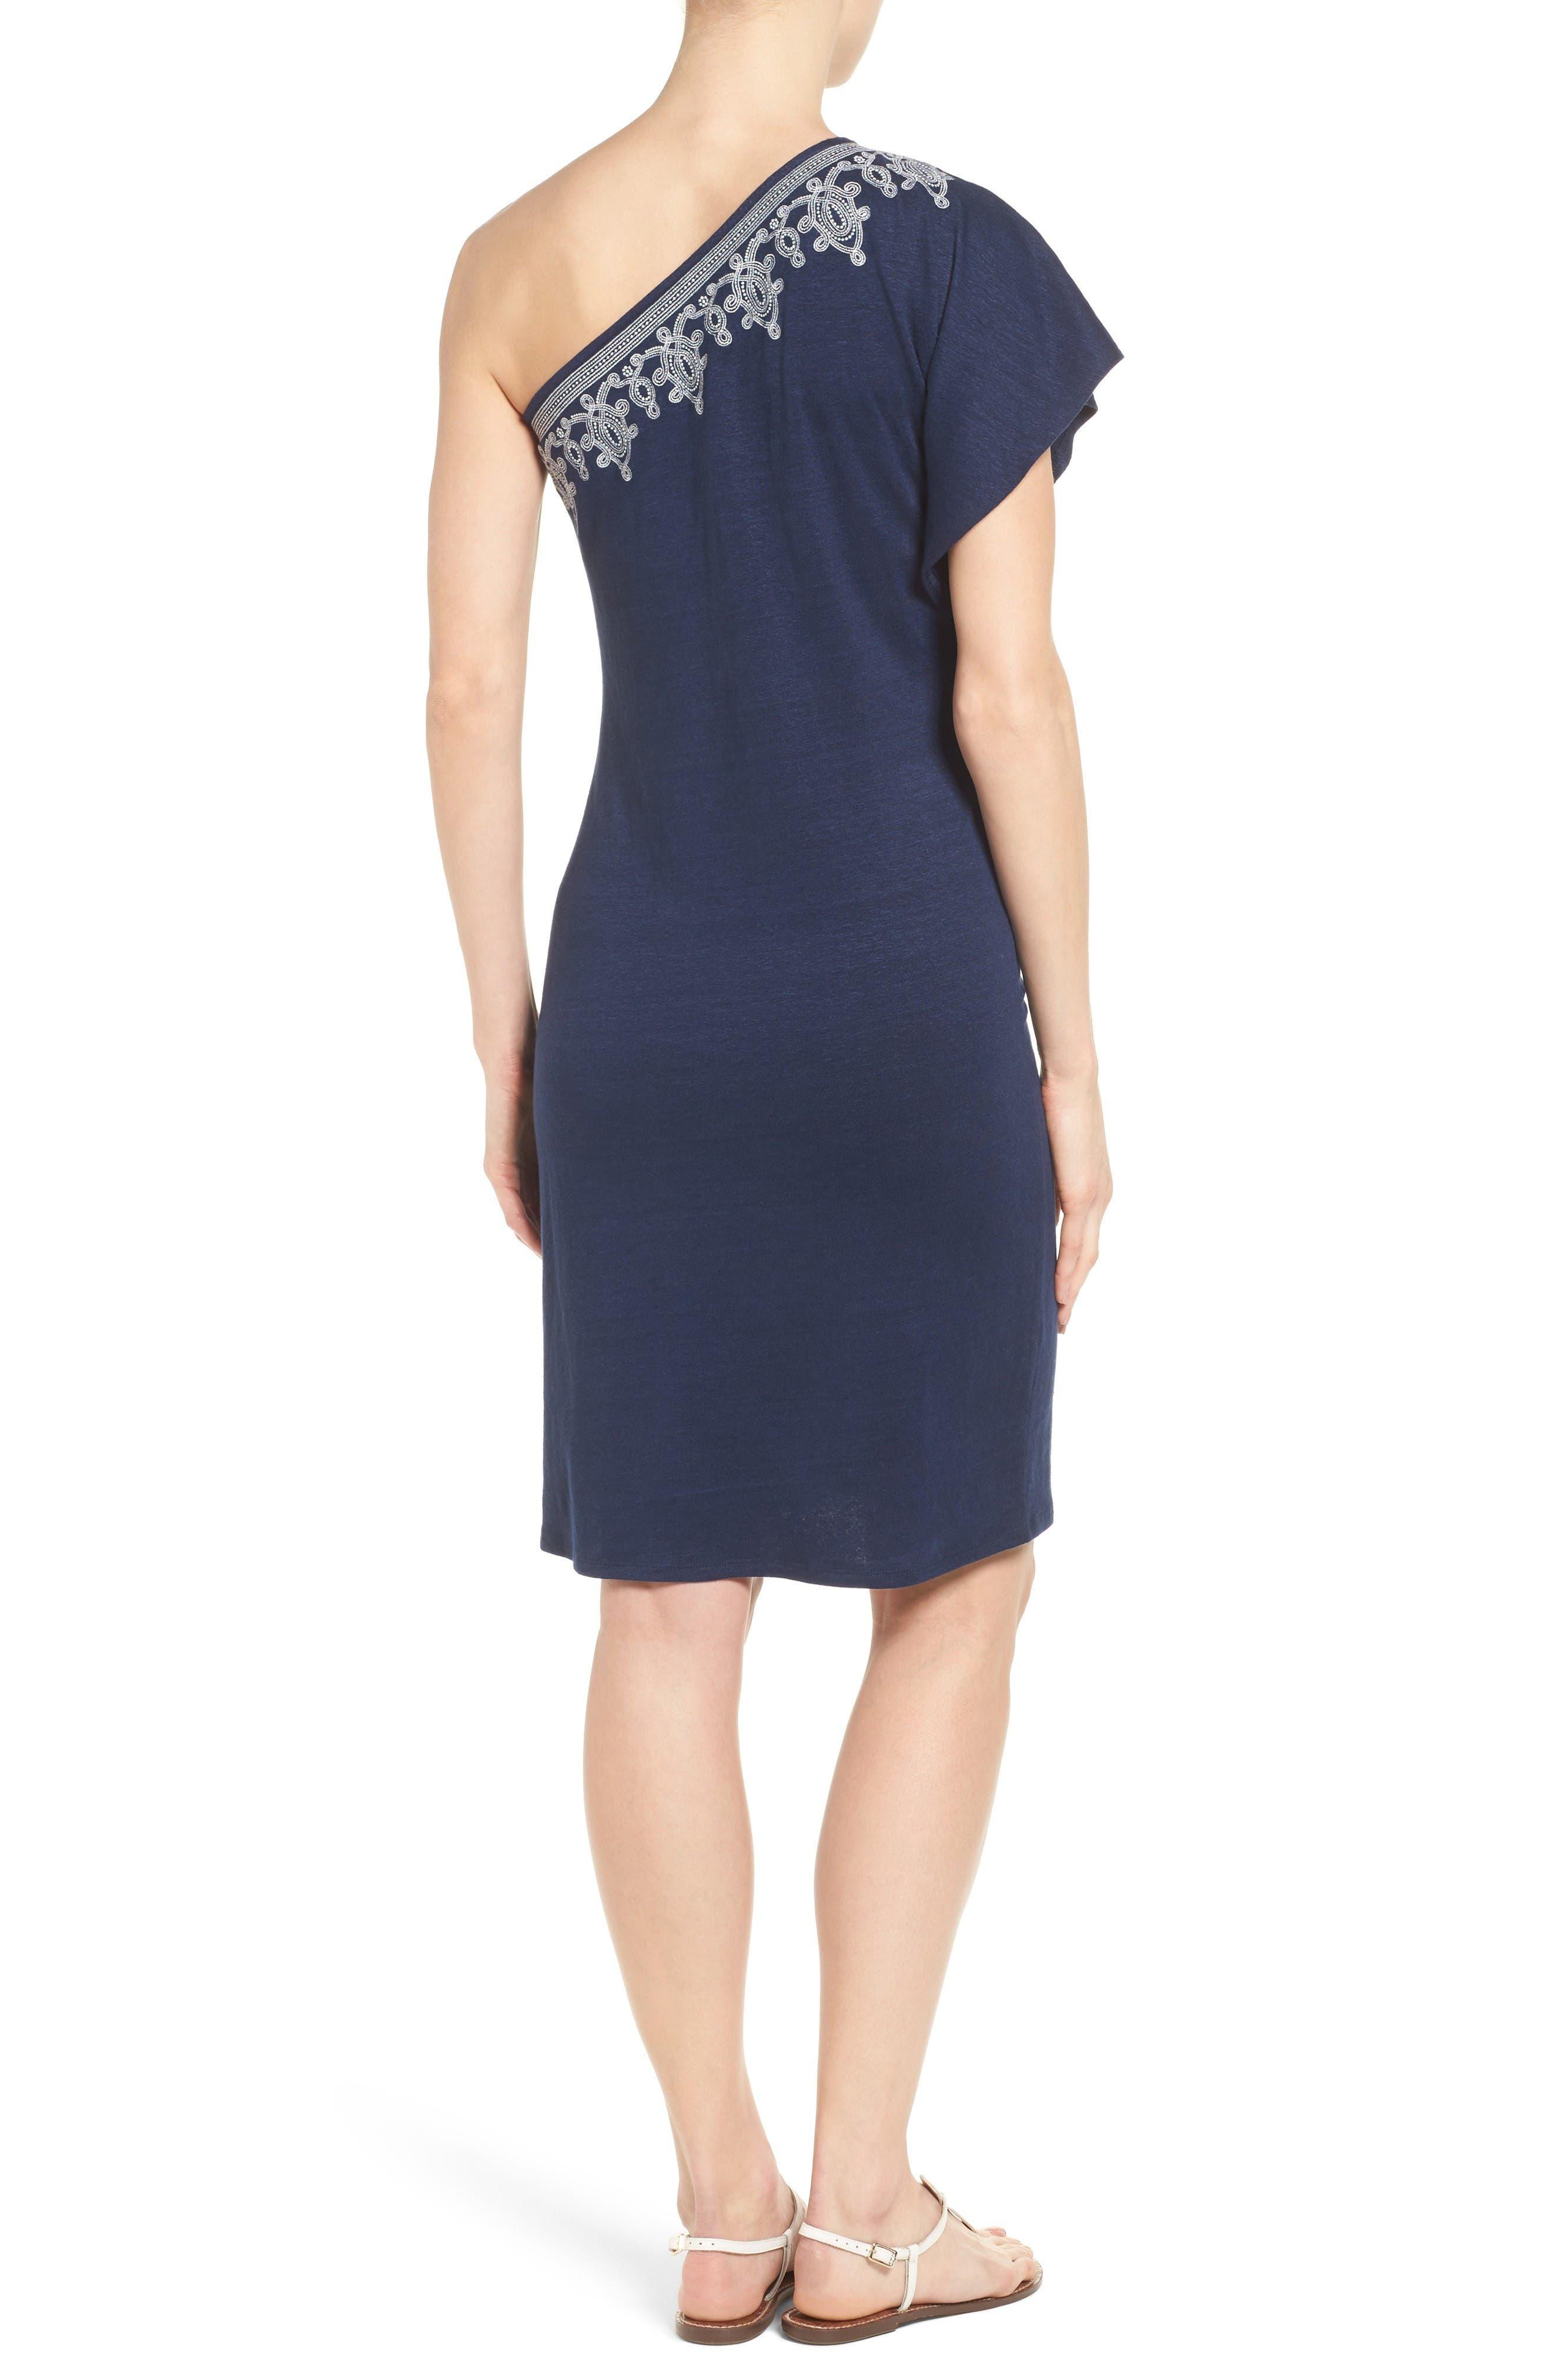 Lovelin One-Shoulder Dress,                             Alternate thumbnail 2, color,                             Ocean Deep